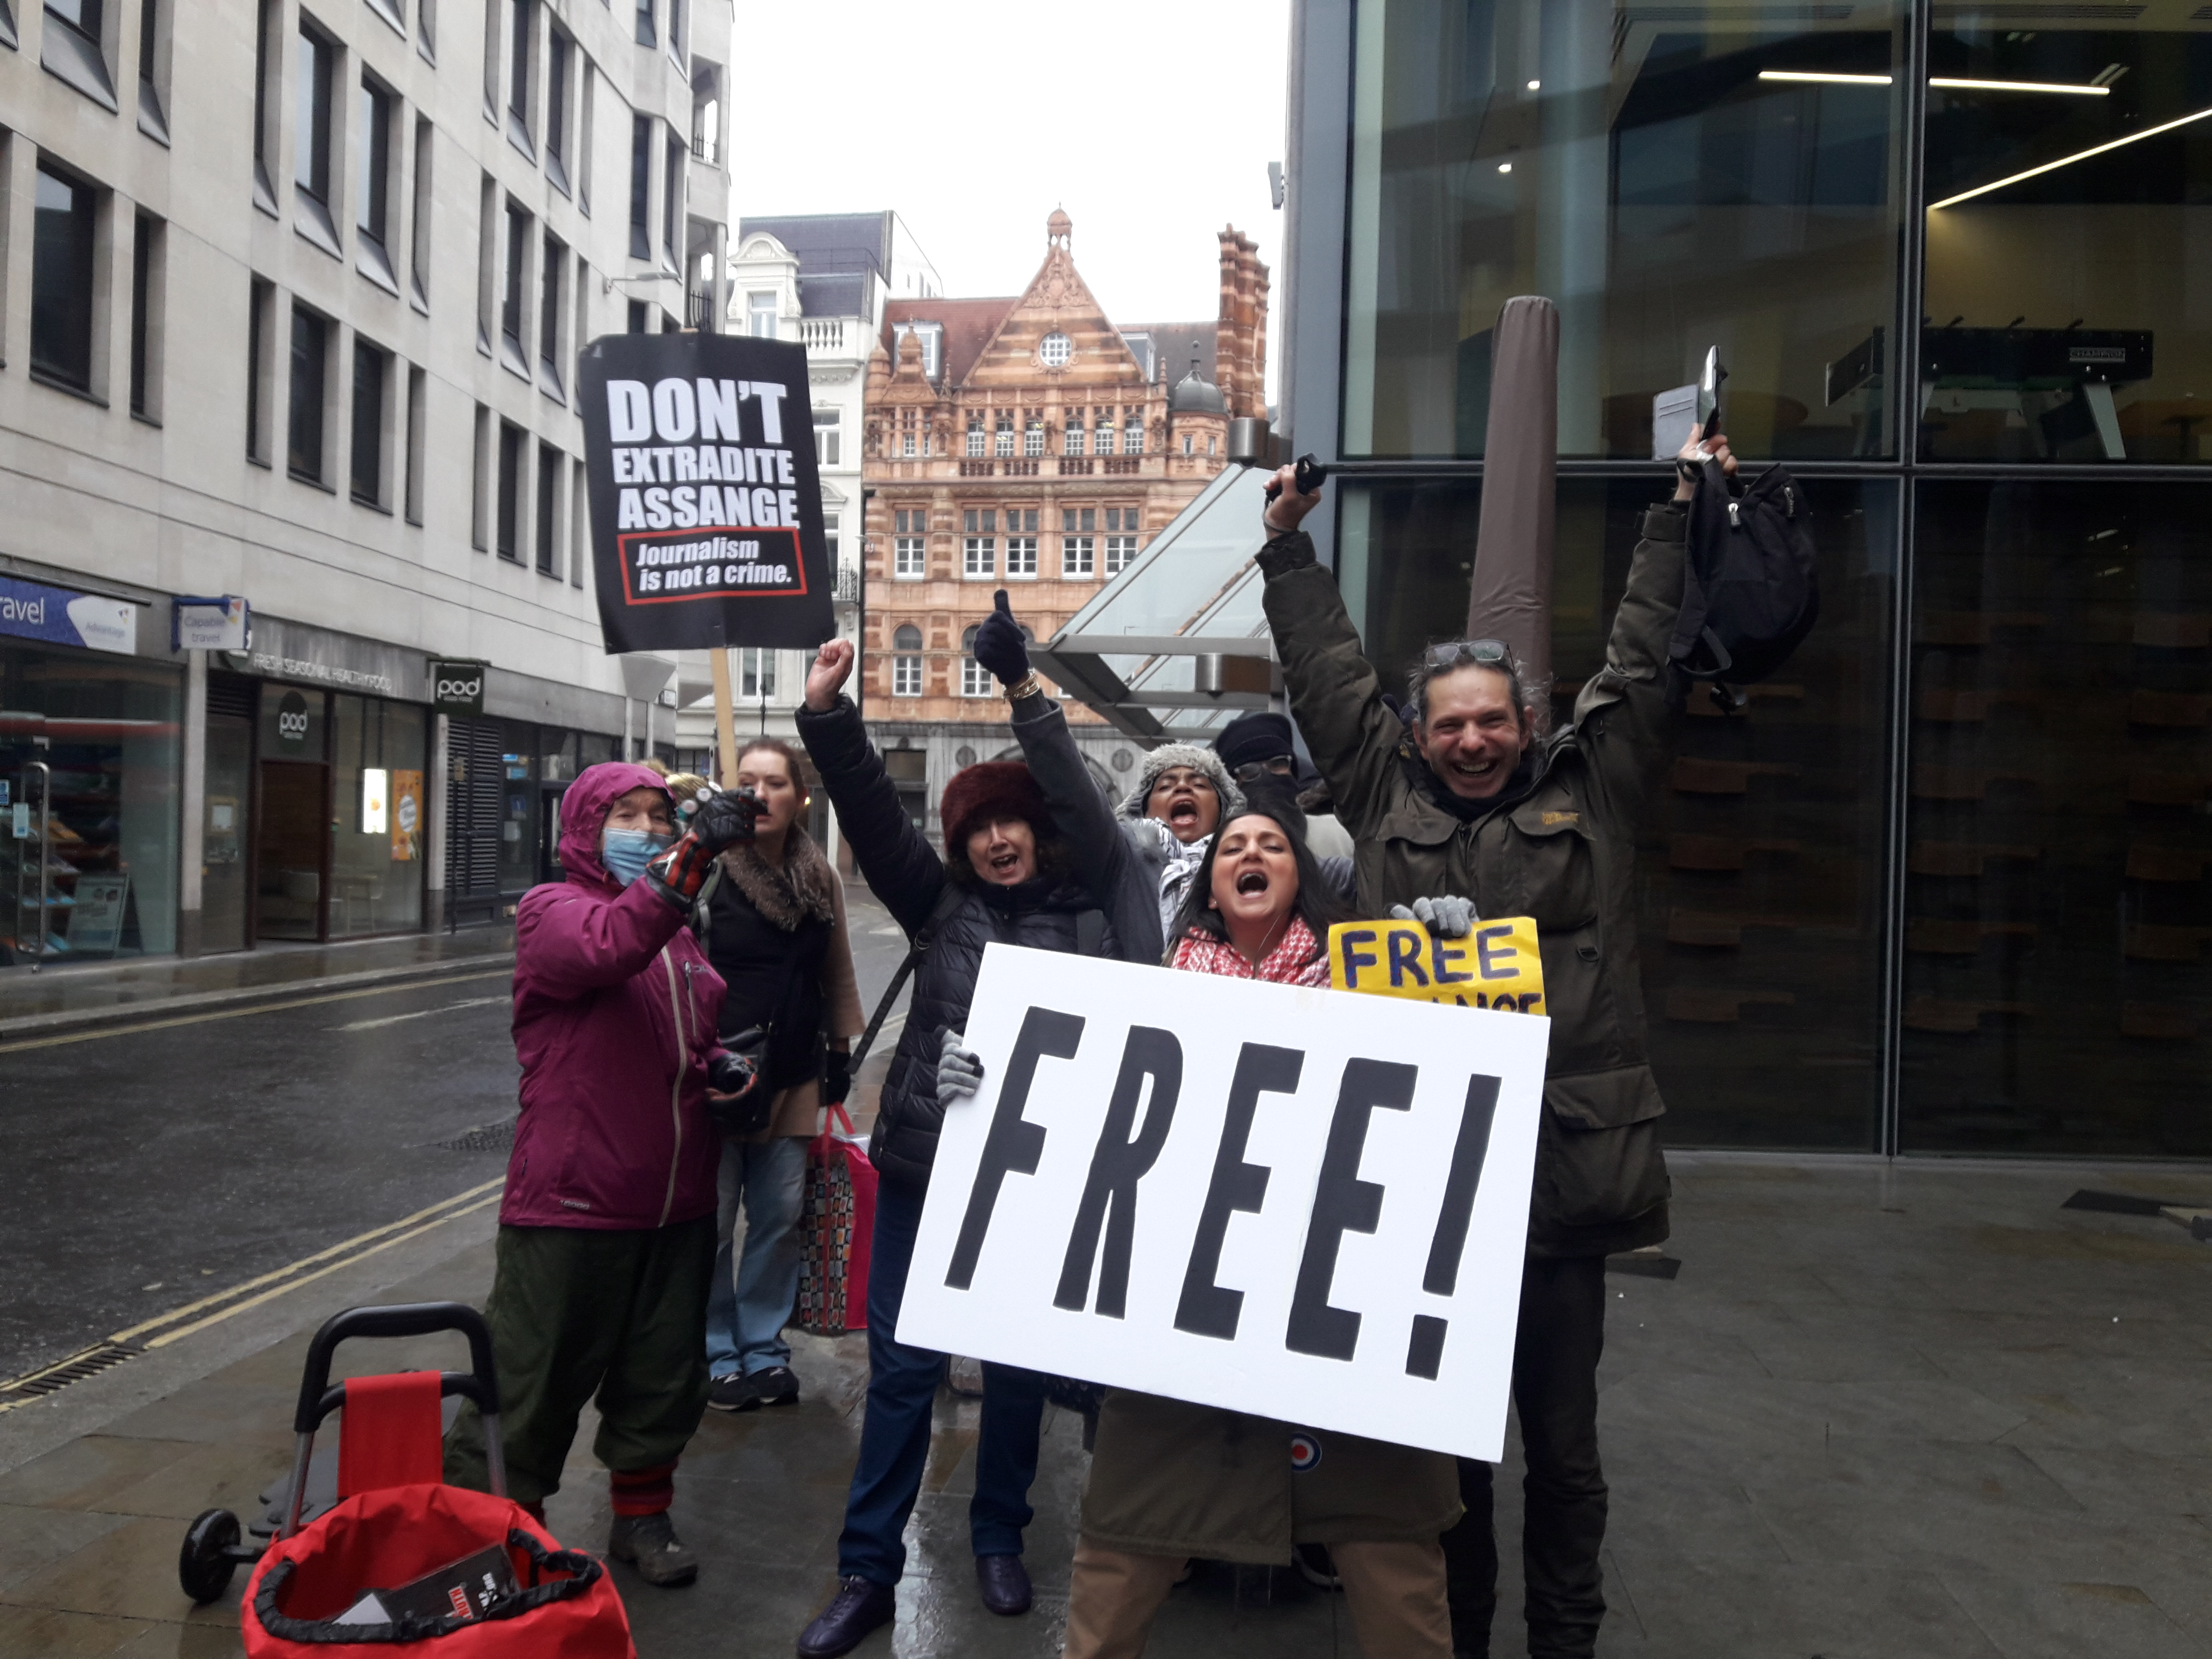 protest_photos:freegroup.jpg